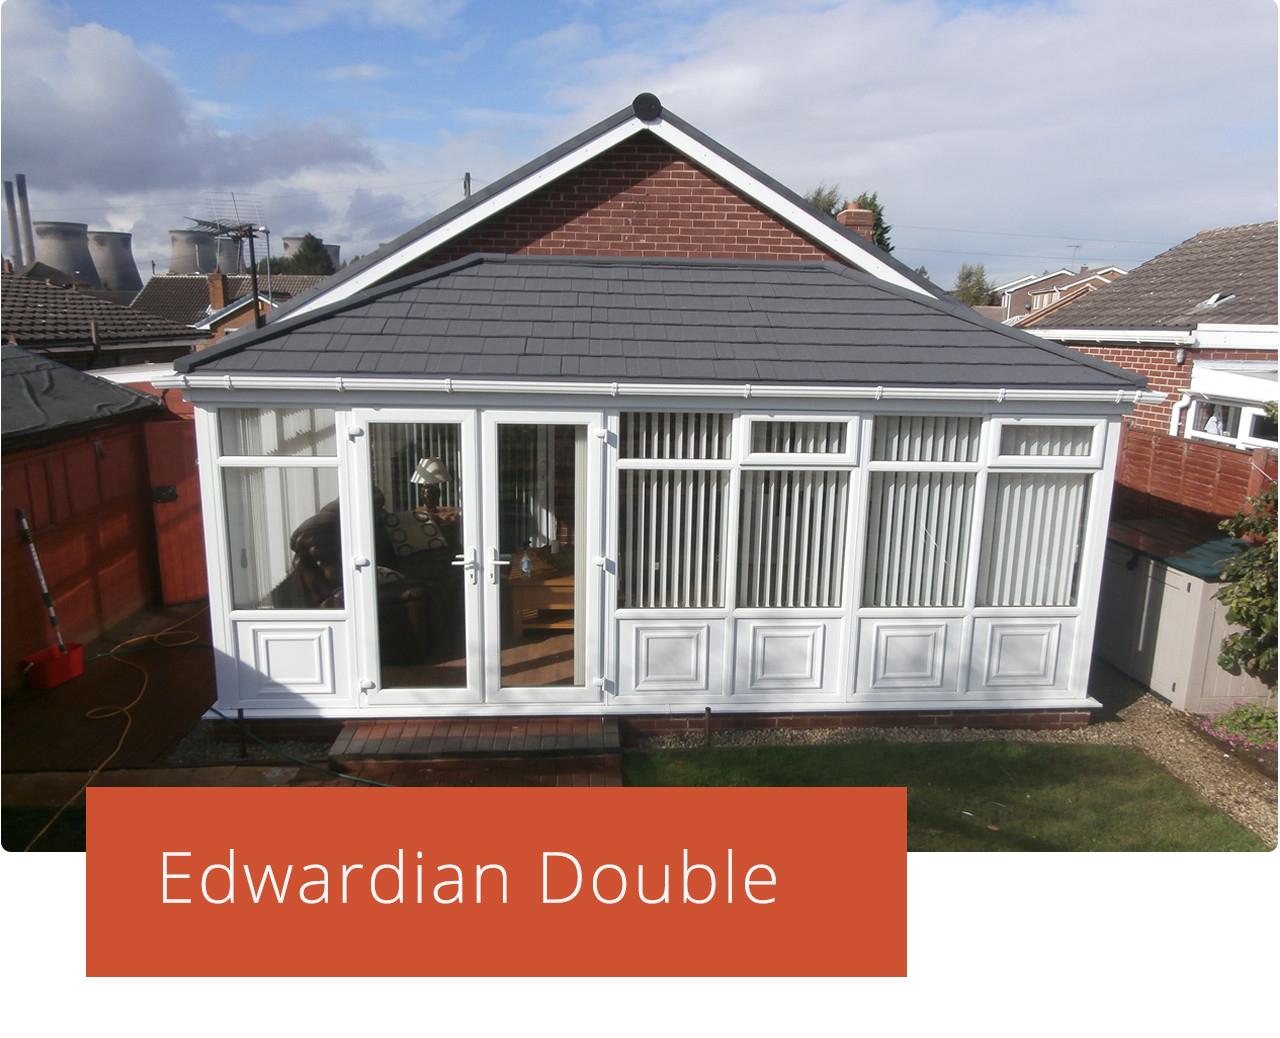 edwardian-double-hipped copy